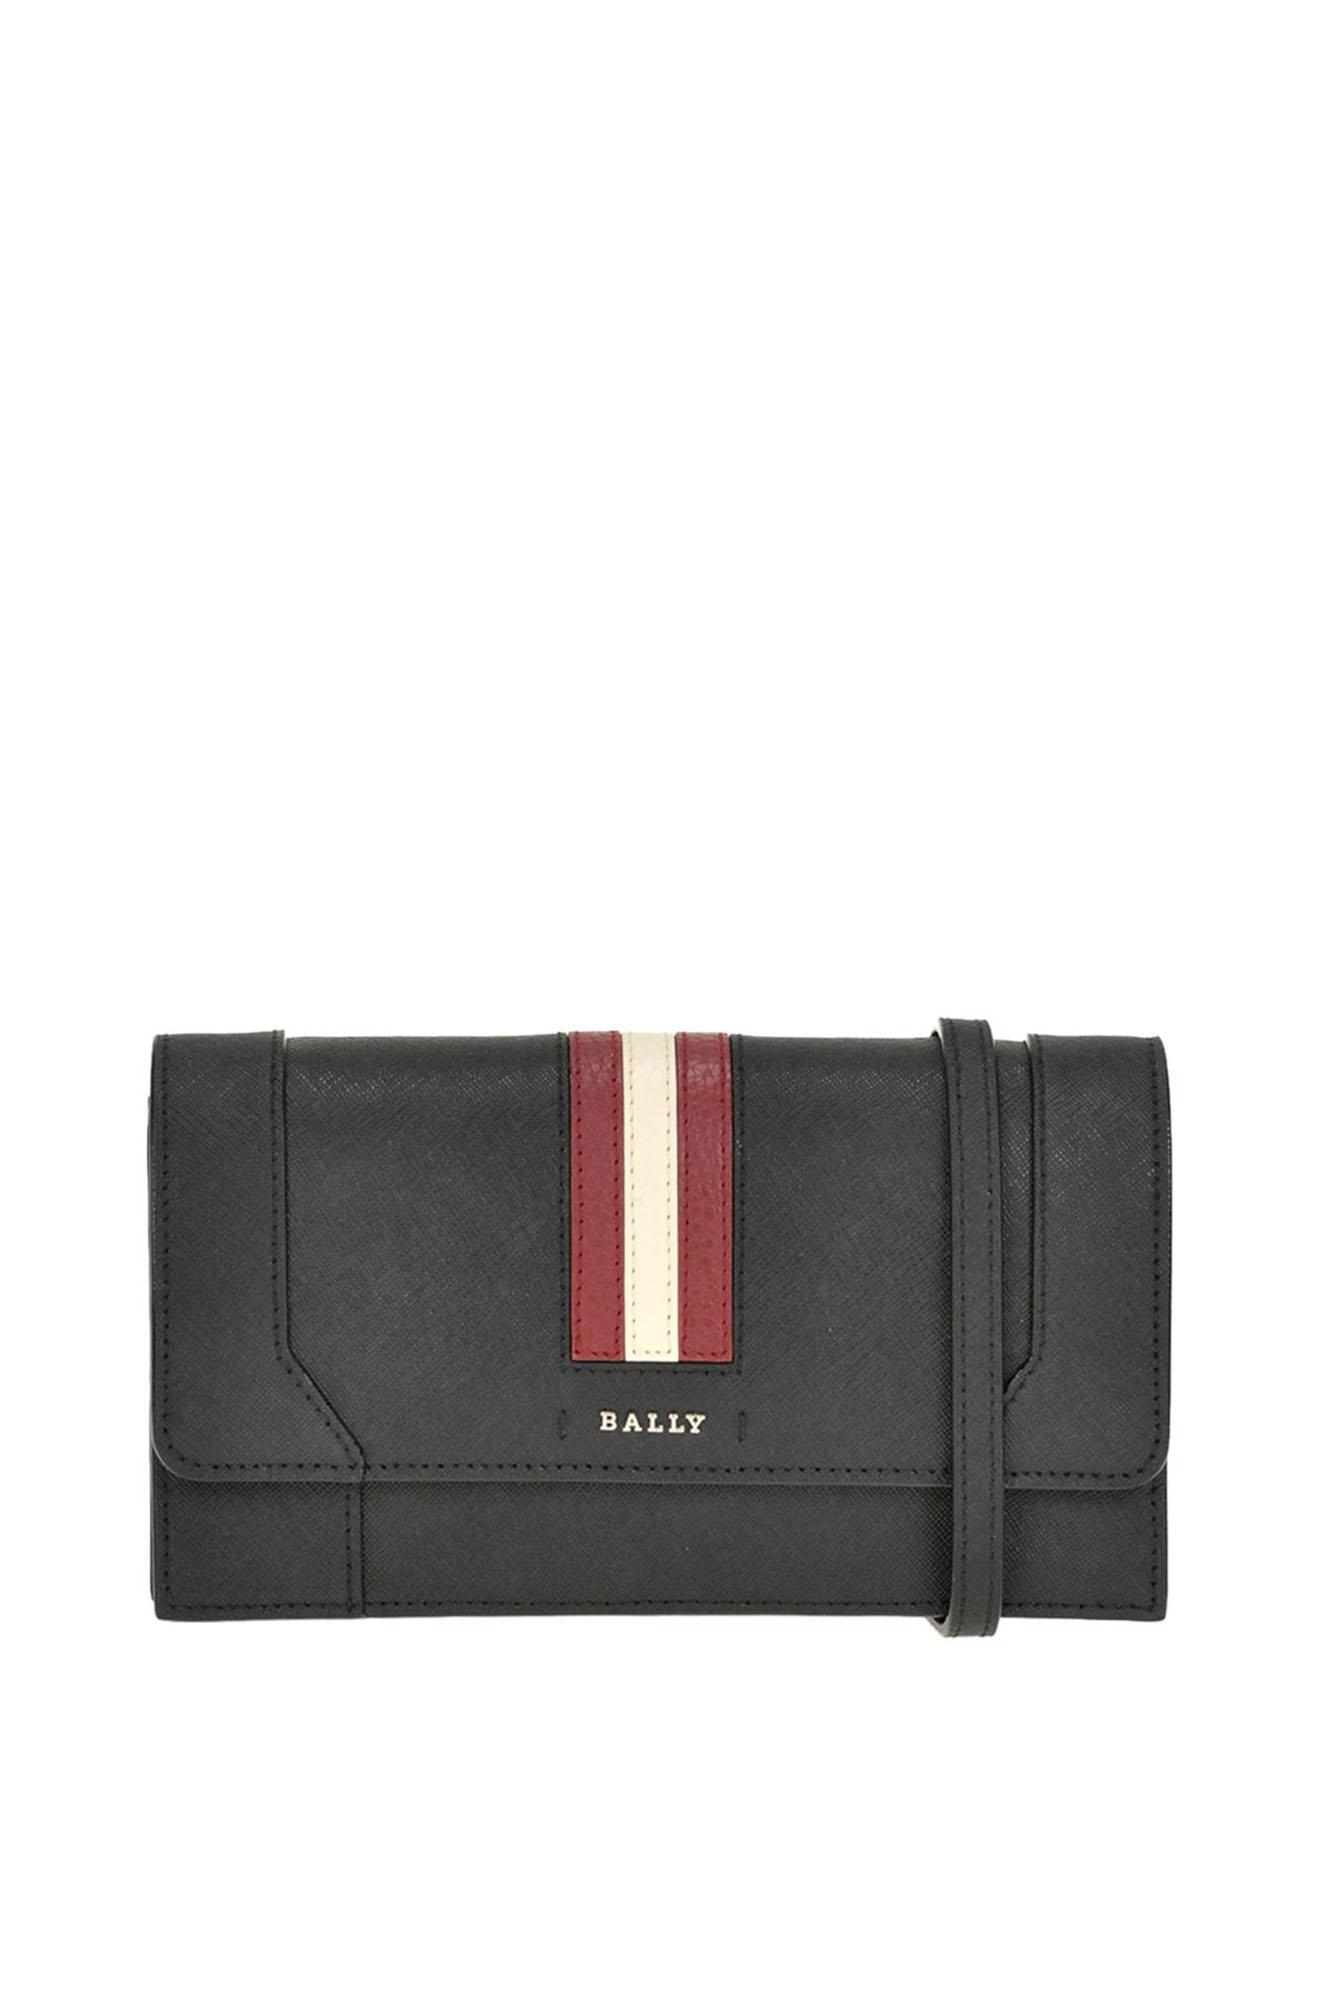 Stafford Leather Clutch in Black